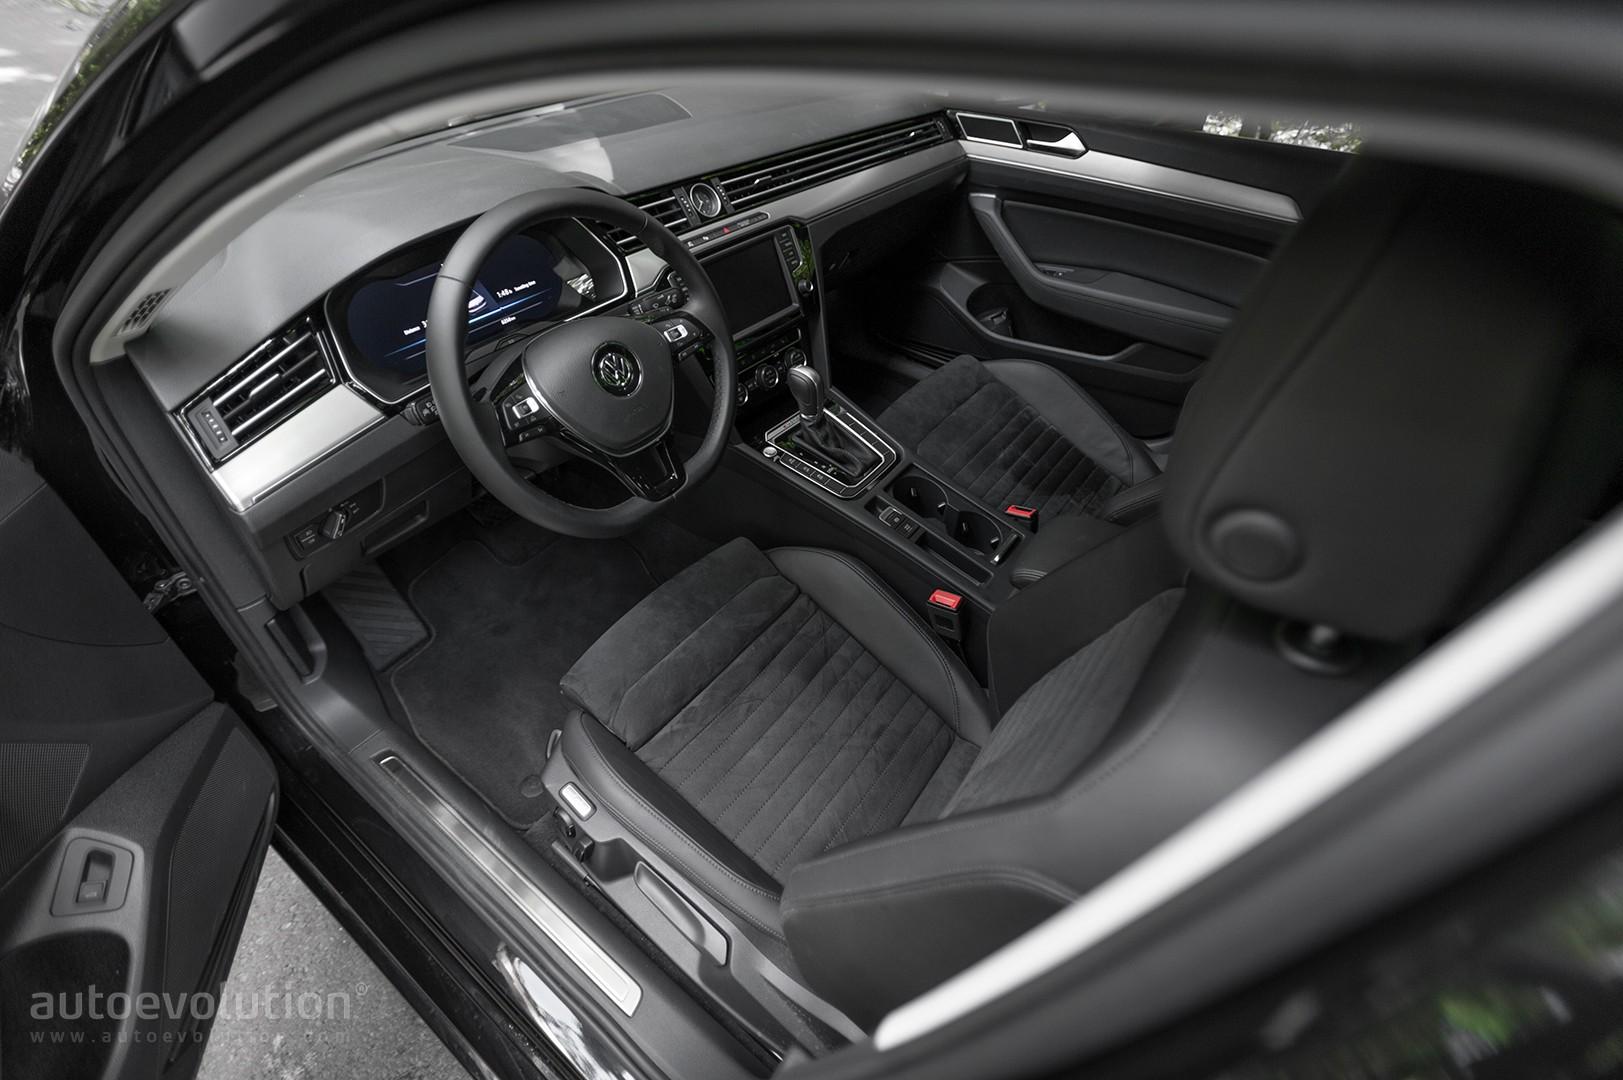 2016 Volkswagen Passat 2 0 BiTDI 4Motion Review - autoevolution